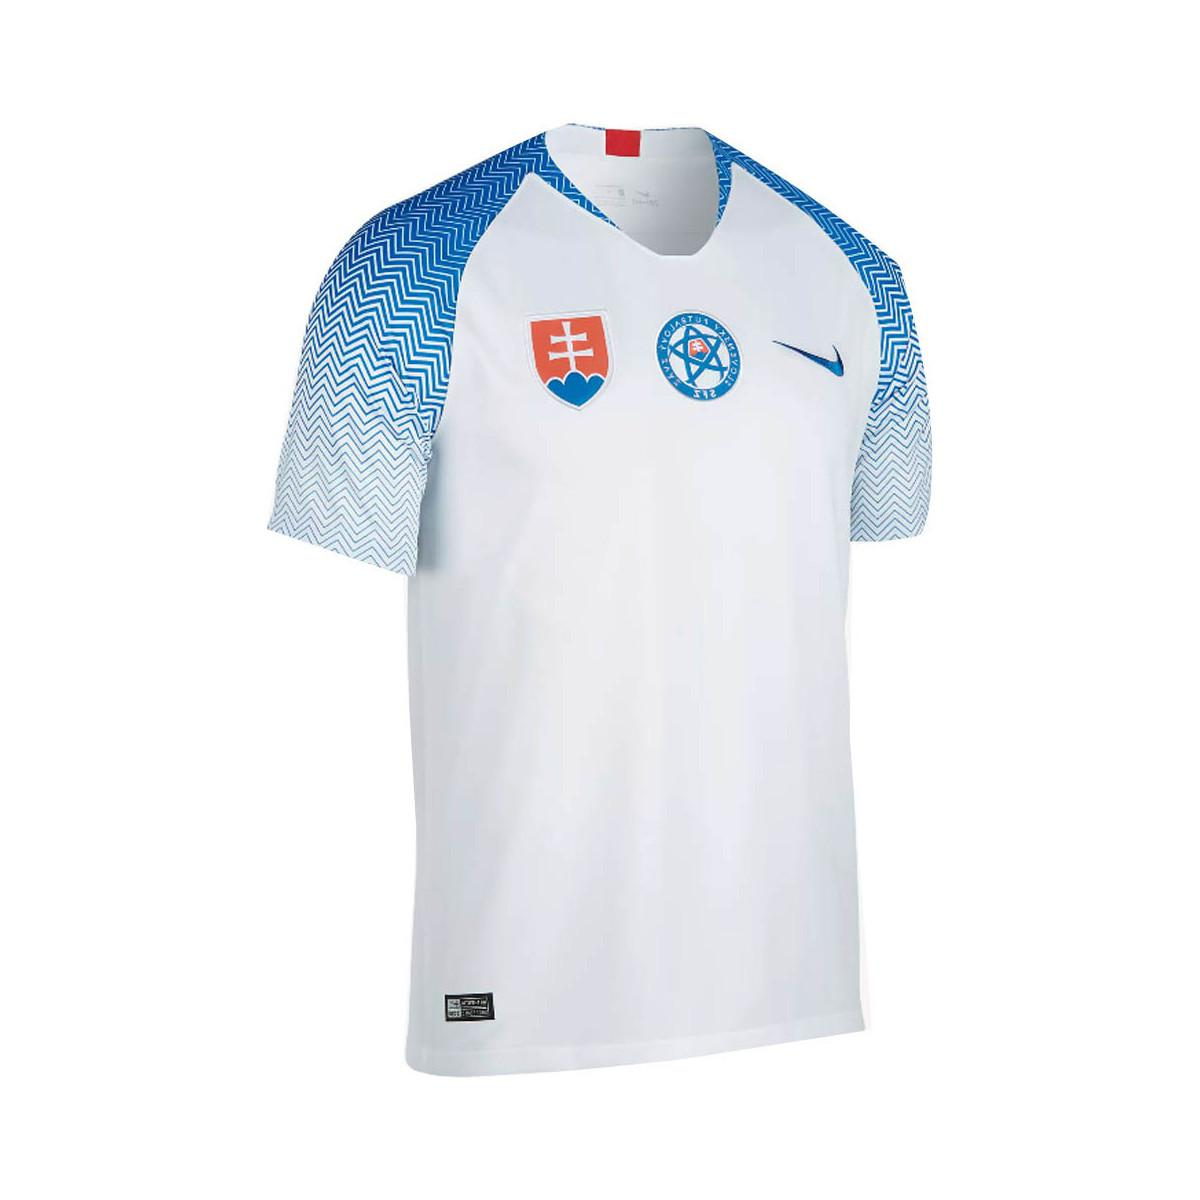 Nike 2018-2019 Slovakia Home Football Shirt Women s T Shirt In White ... 939259a0c82